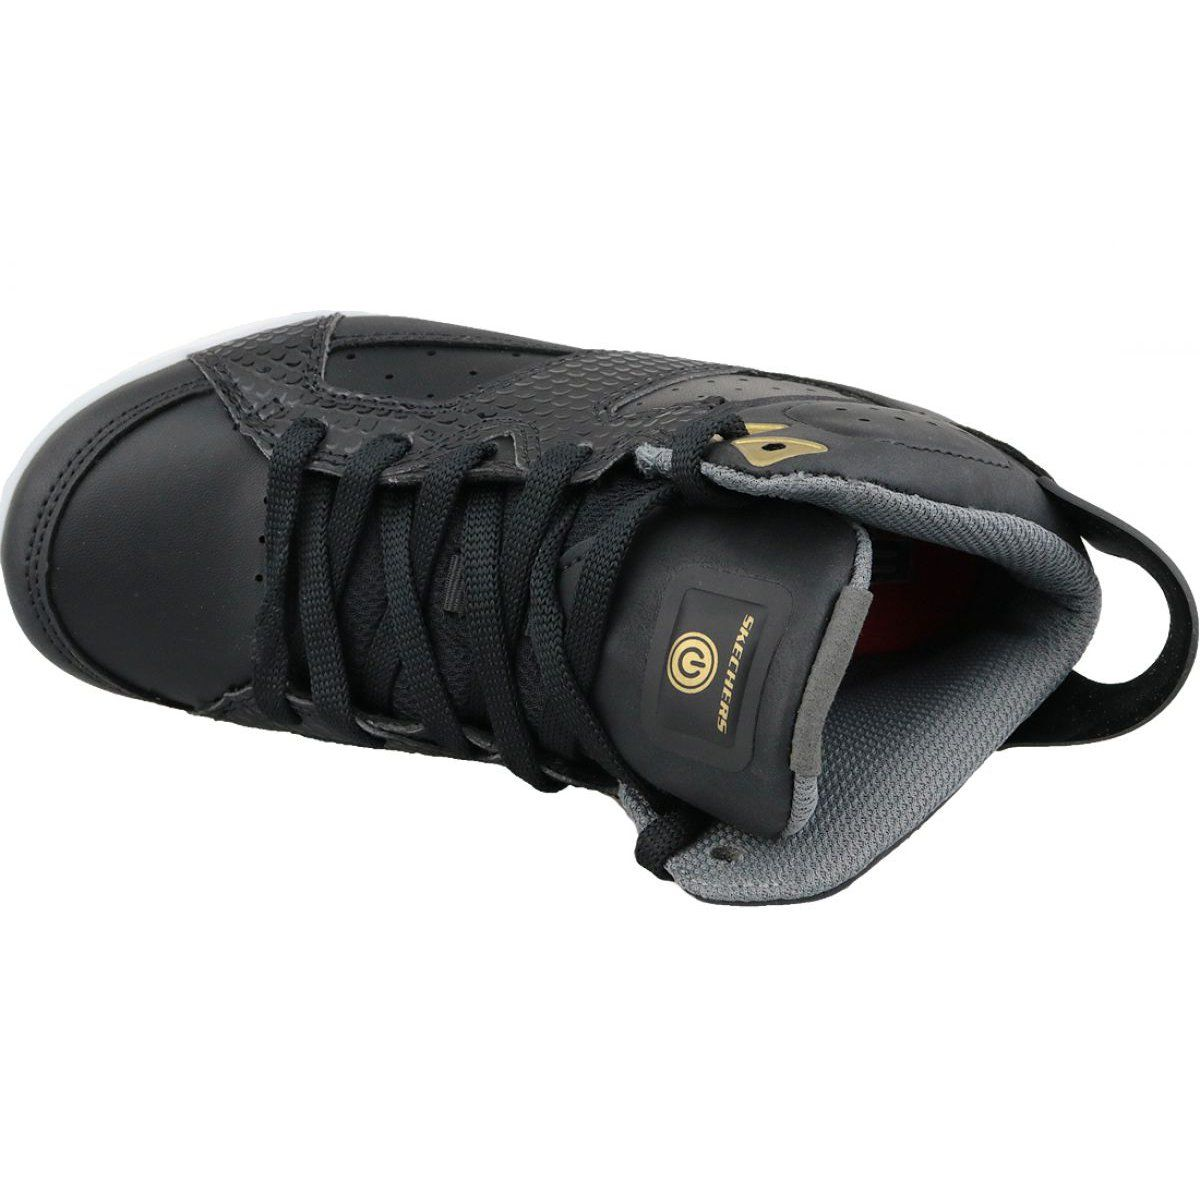 Buty Skechers E Pro Street Quest Lights Jr 90615l Blk Czarne Junior Shoes Skechers Kid Shoes